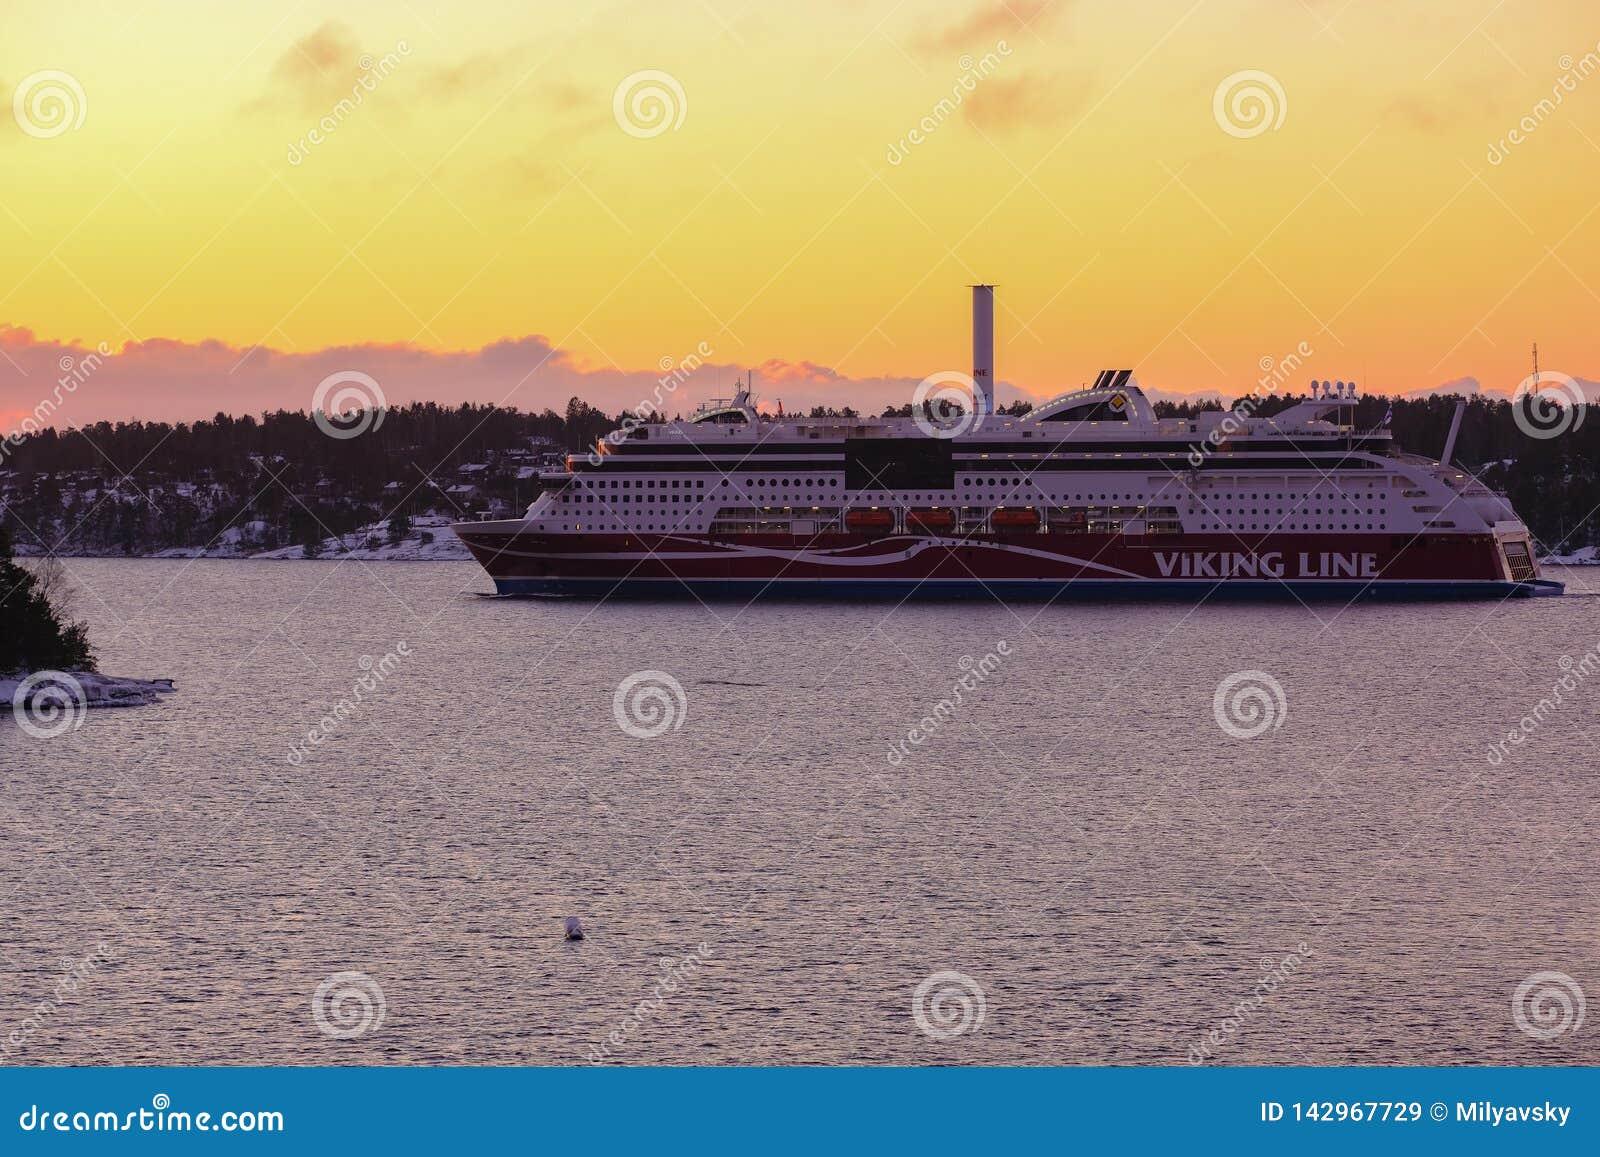 Viking line cruise lIner, sunset